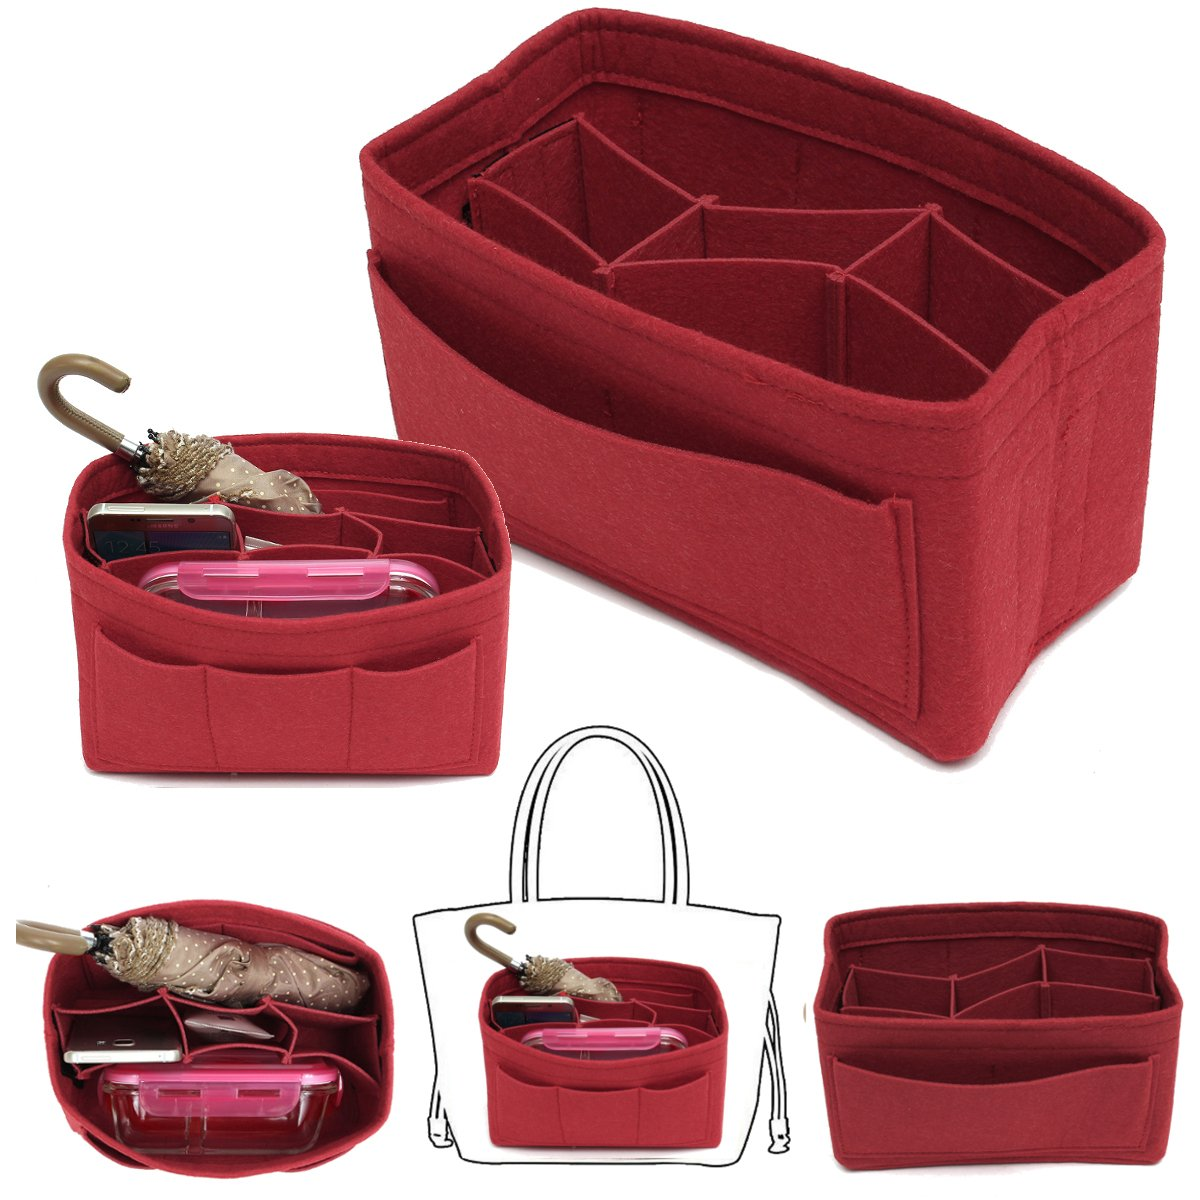 c533eaba1a9 Purse Handbag Organizer | Brydens Xpress